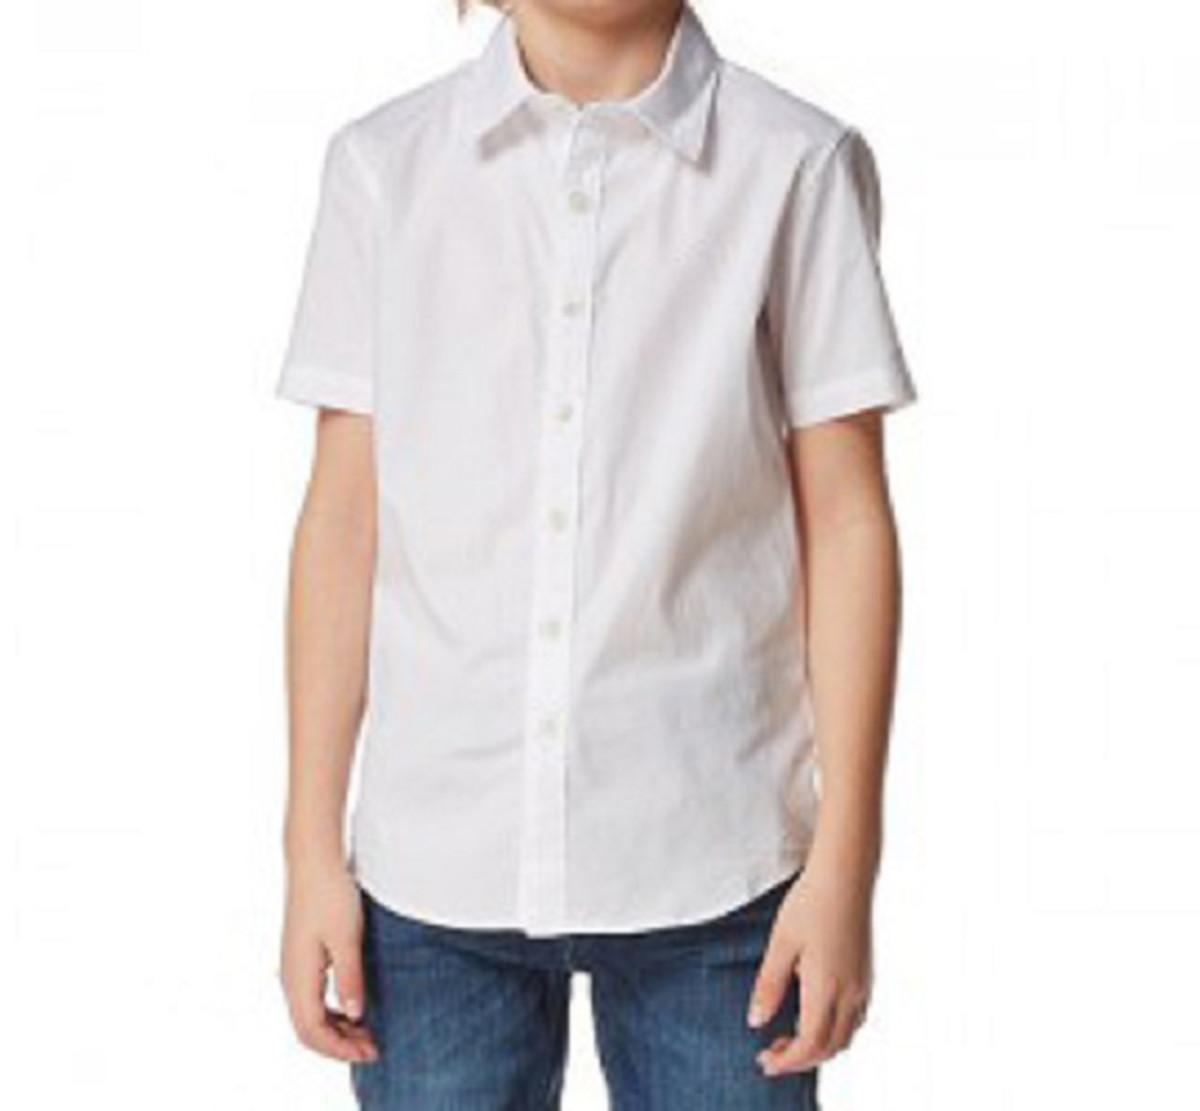 e0c9faa3db Camisa Branca Social Infantil manga curta no Elo7